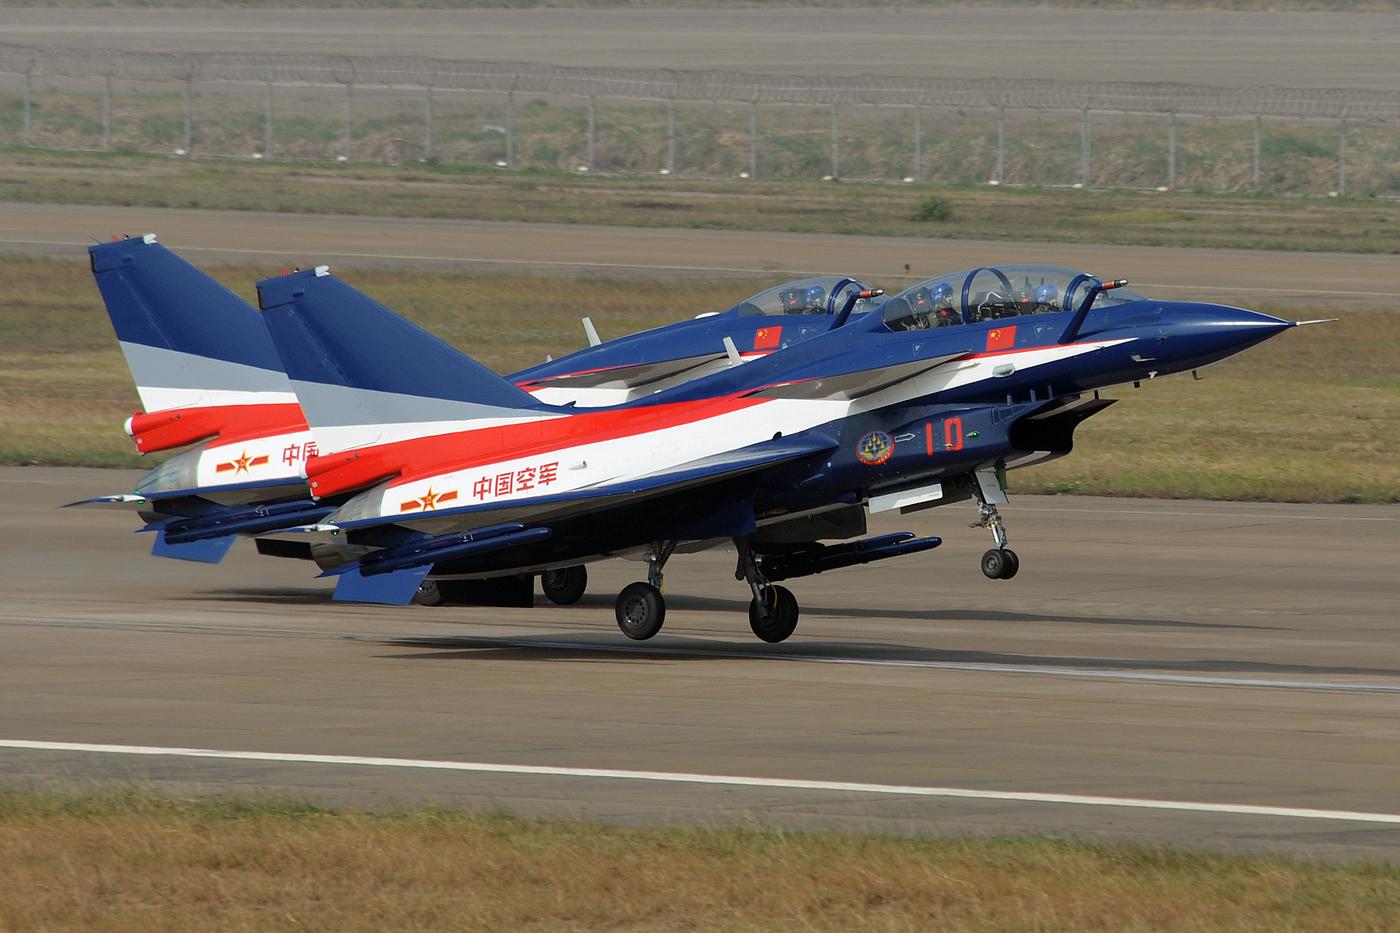 File:China airforce J10.jpg - Wikimedia Commons